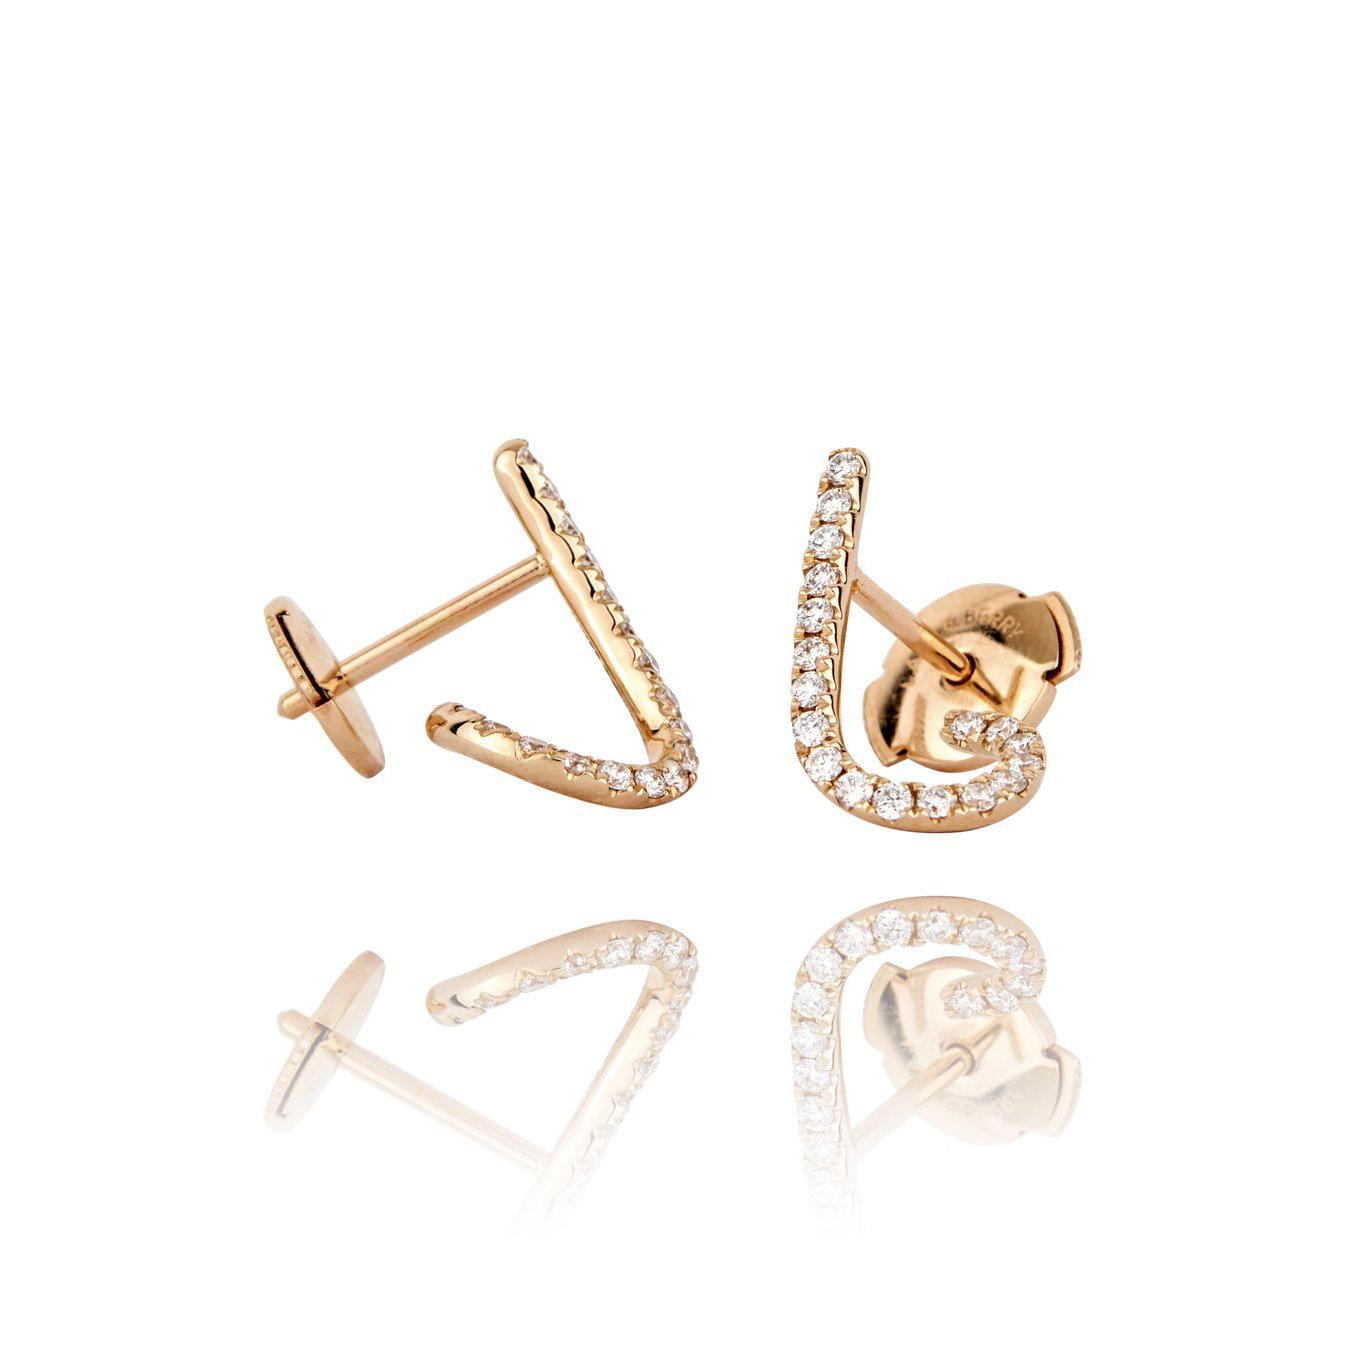 Modernist crawlers earrings